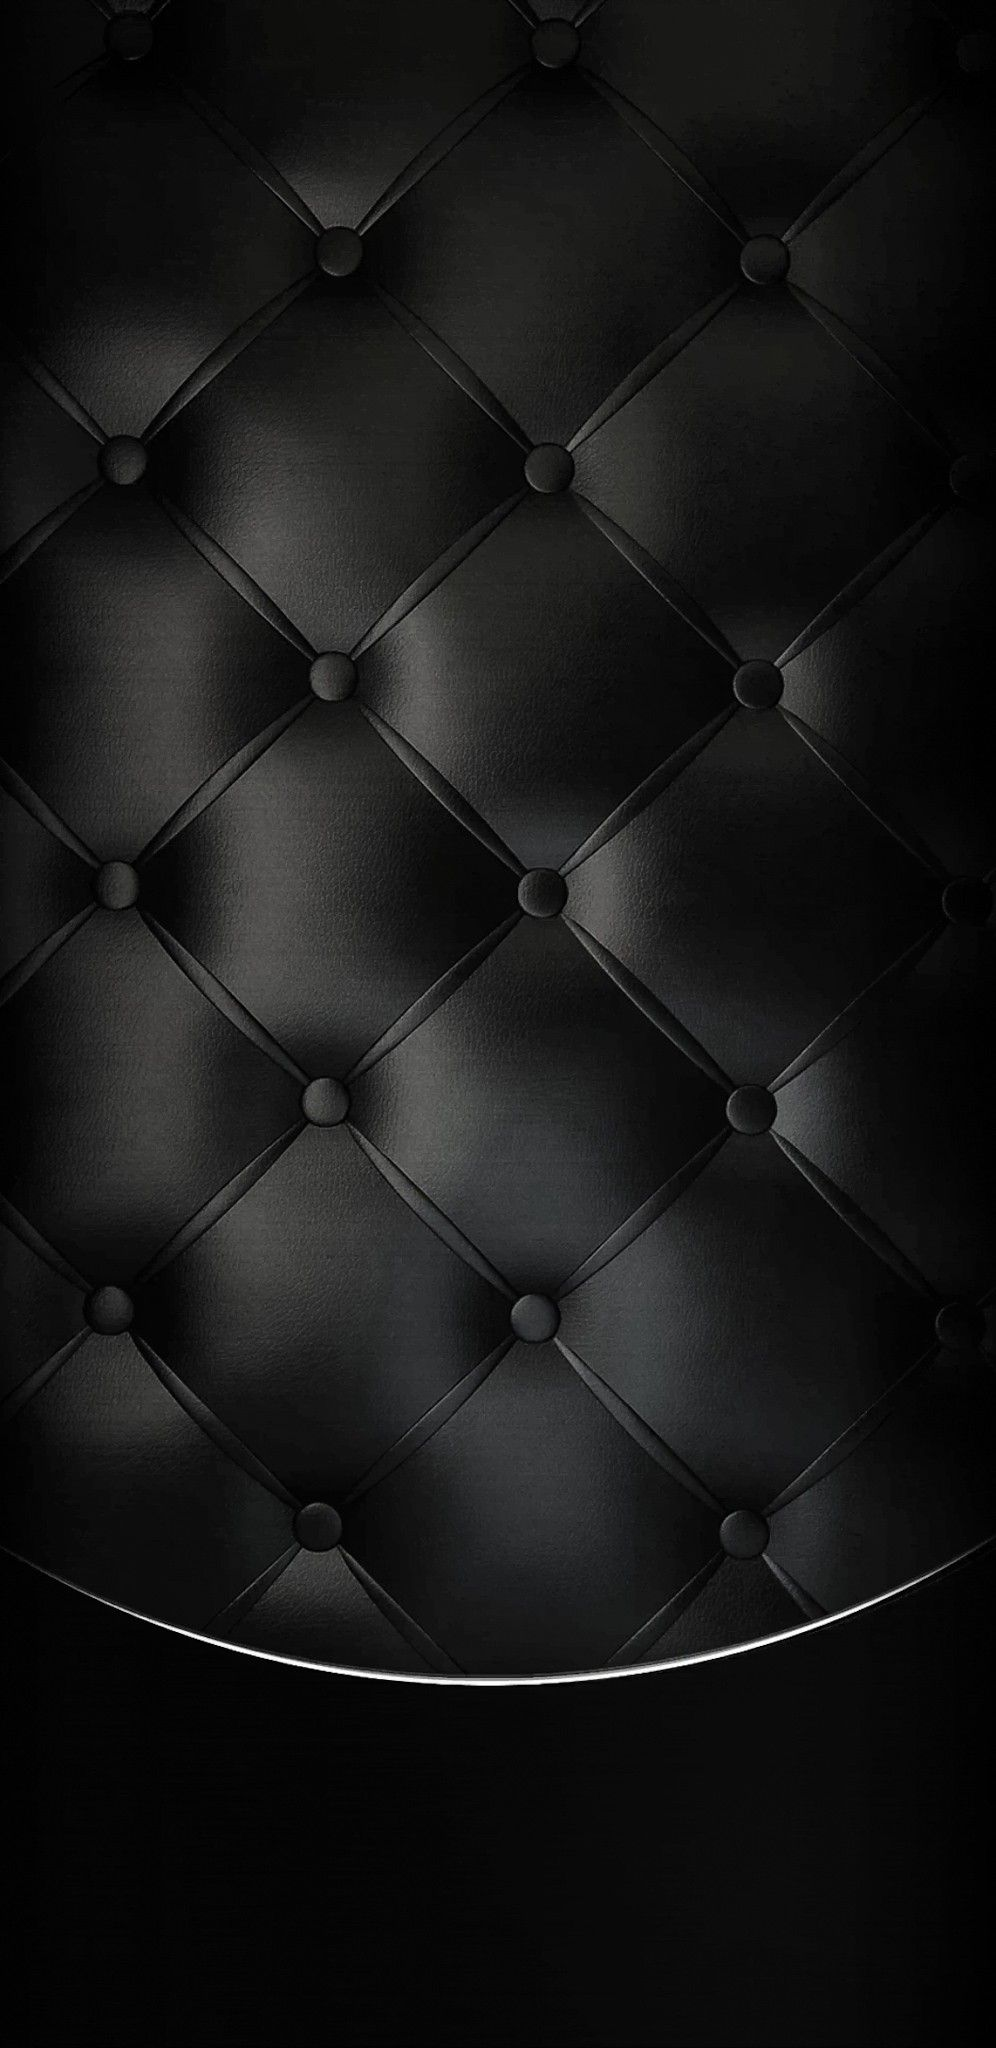 Wallpaper Lockscreen Iphone Android Lock Screen Wallpaper Black Wallpaper Lockscreen